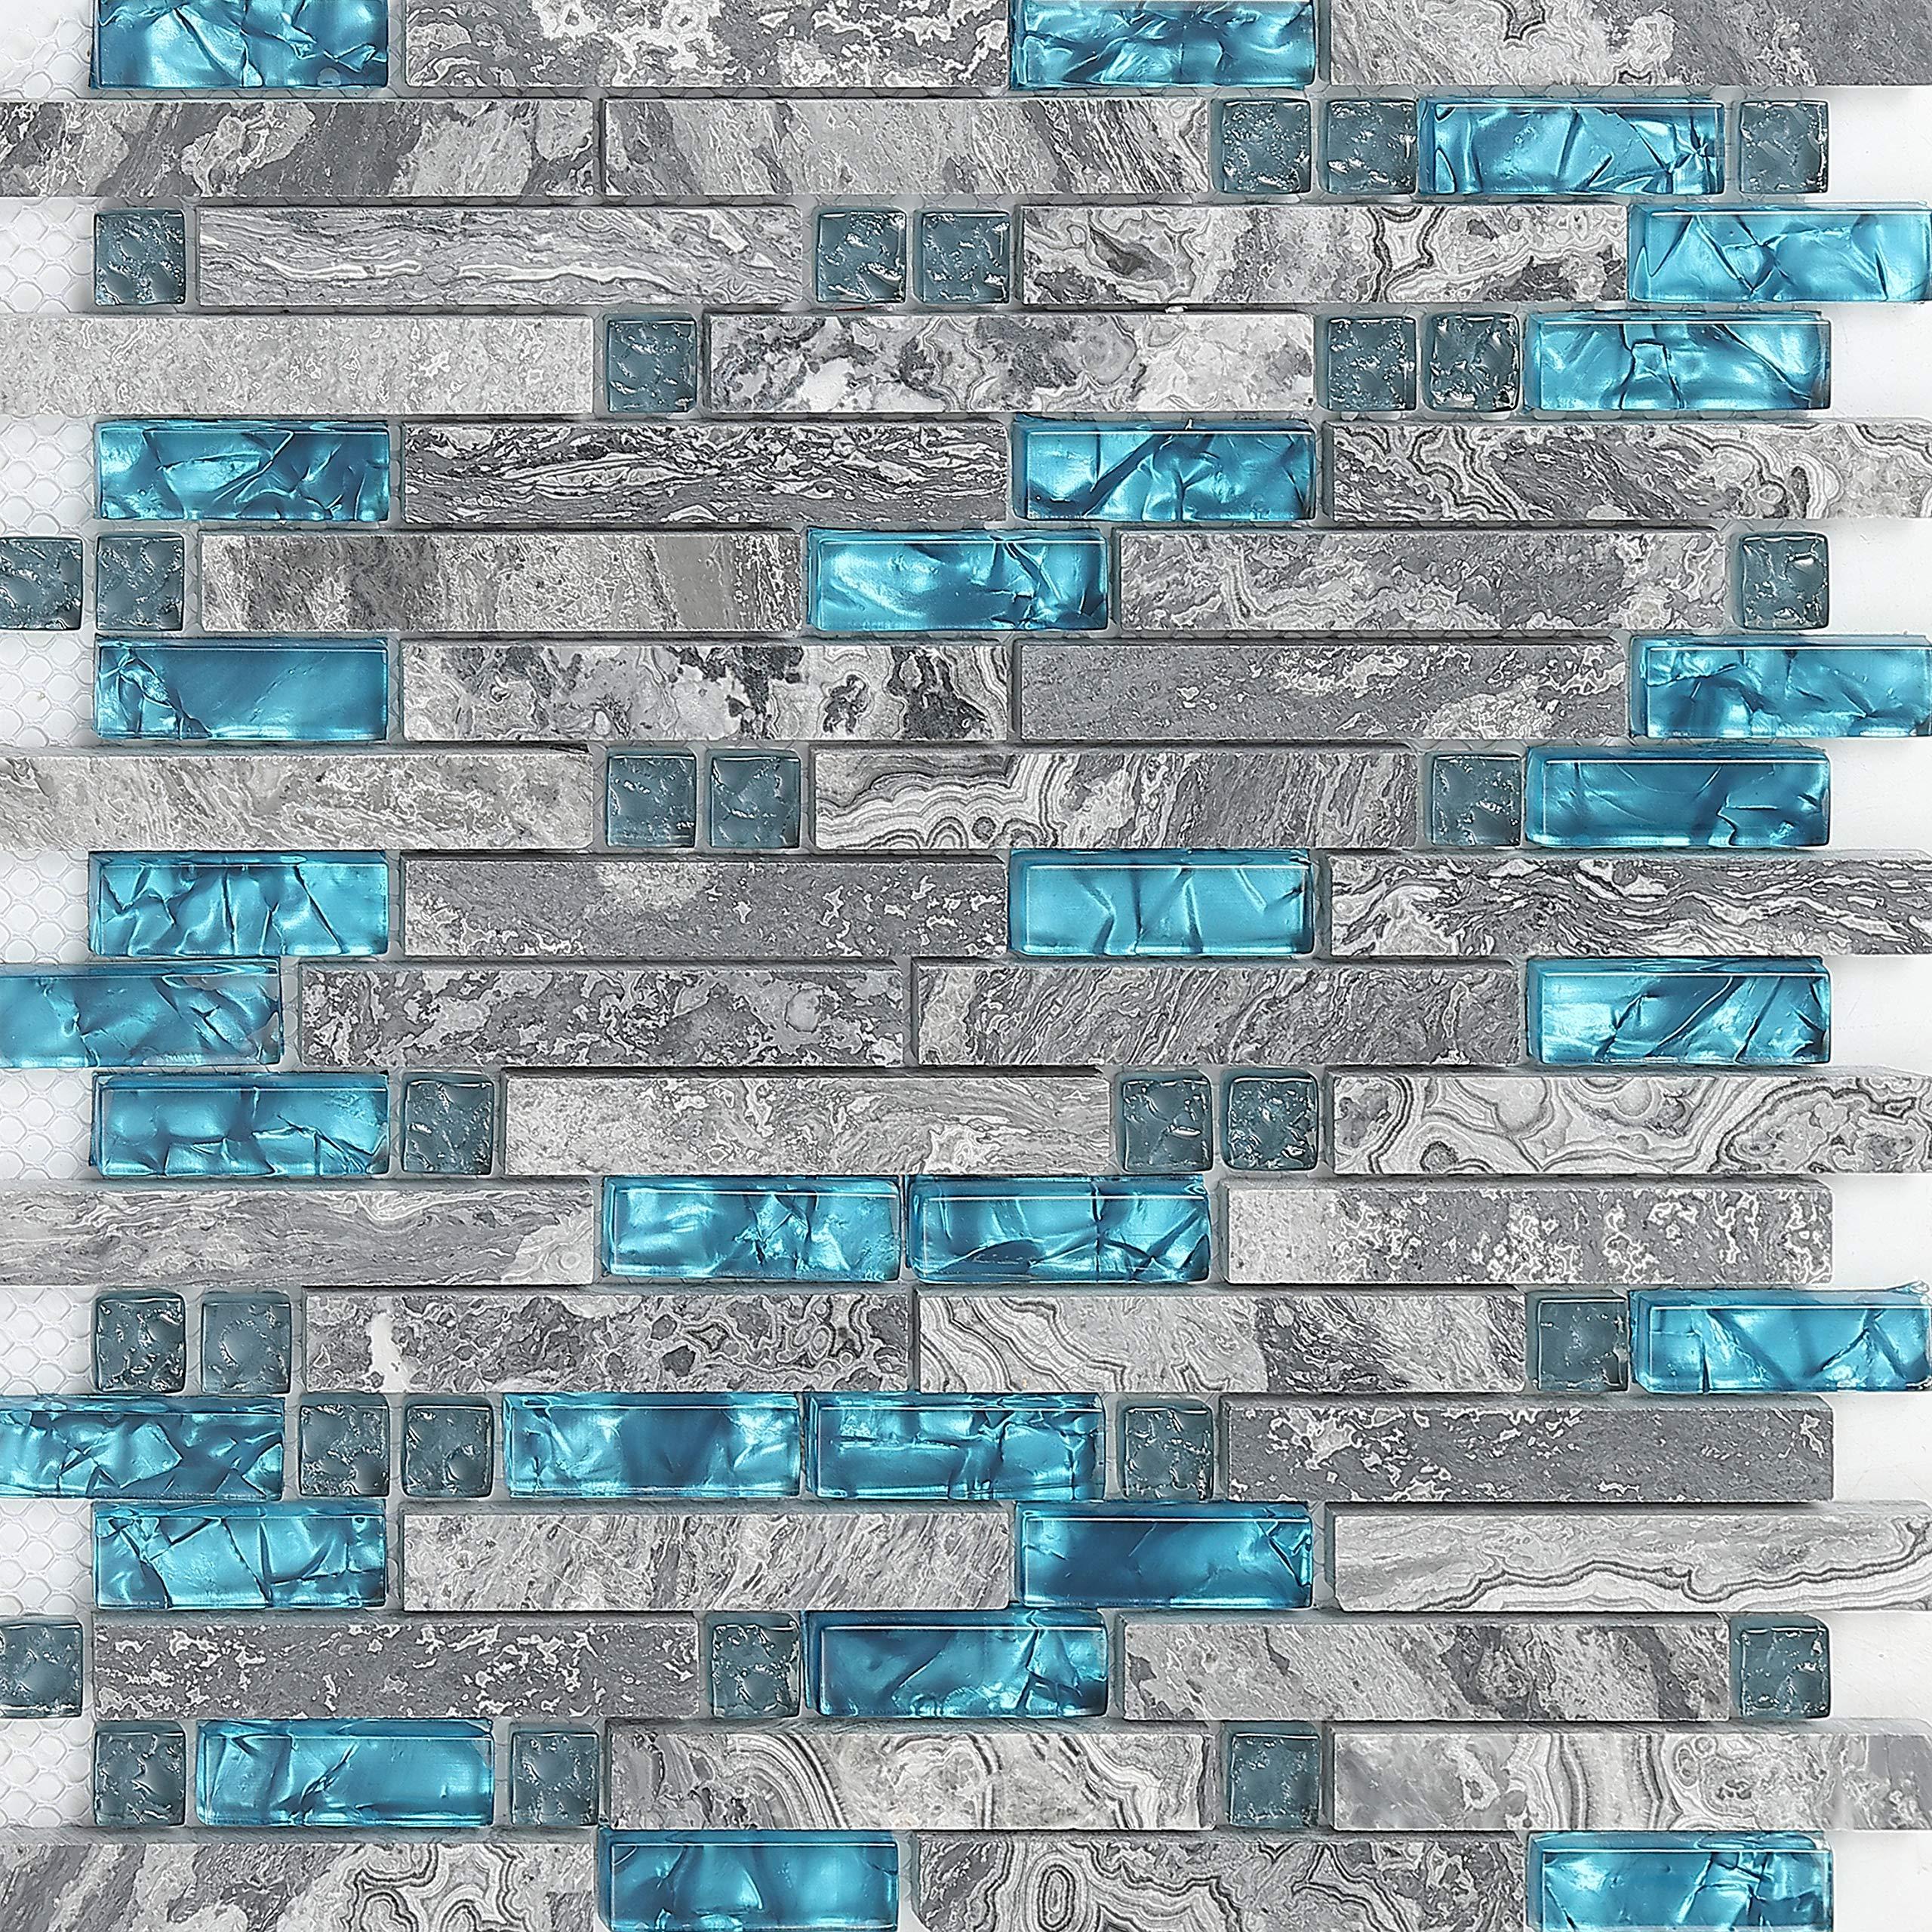 Hominter 11-Sheets Gray Marble Backsplash Wall Tiles, Teal Blue Glass Bathroom Shower Tile, Random Interlocking Patterns Mosaic for Kitchen 9805